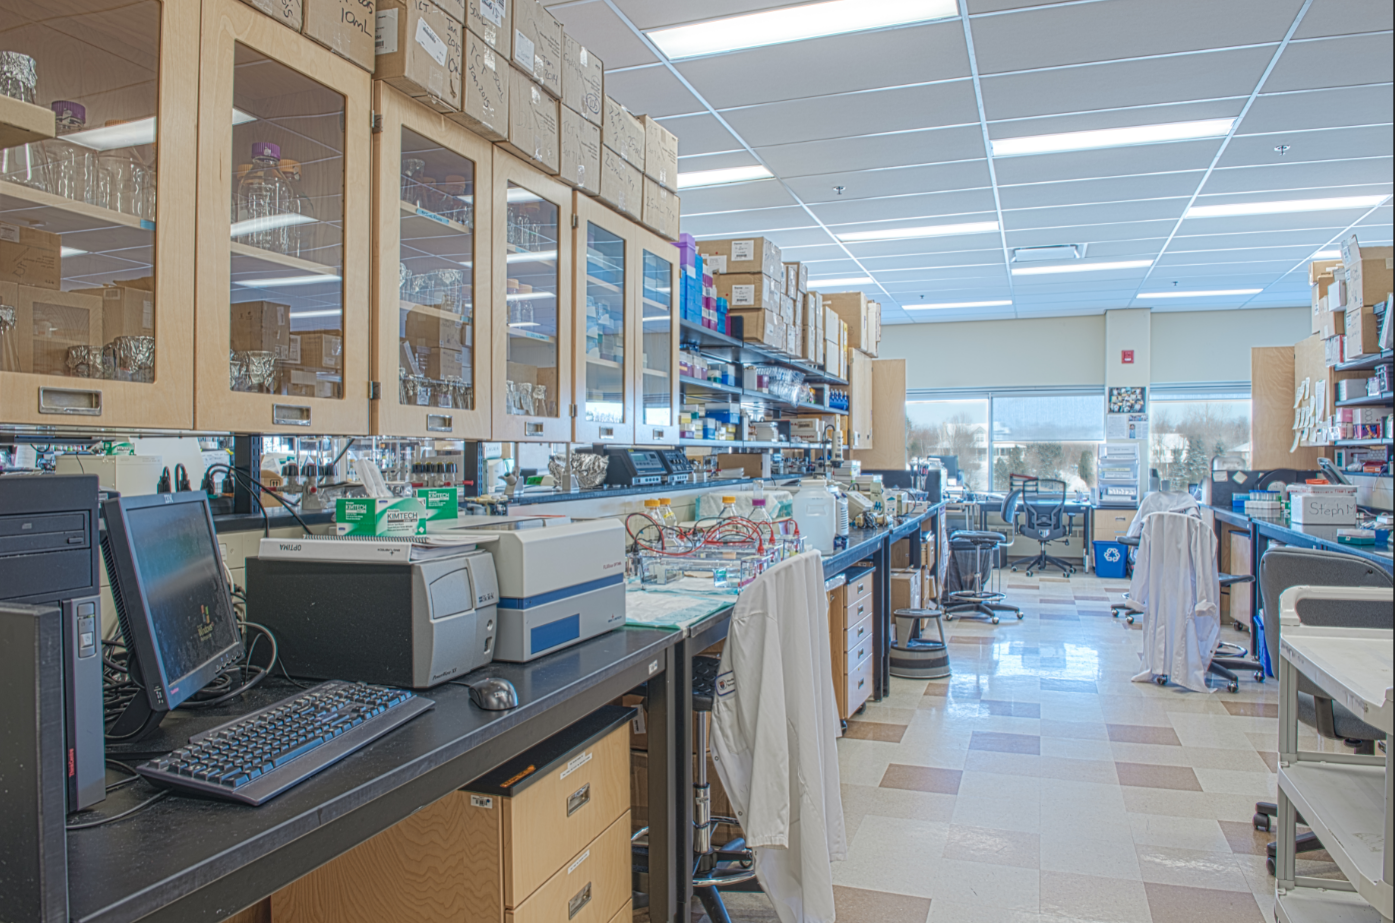 Image of NOSM at Laurentian University Laboratory Facility